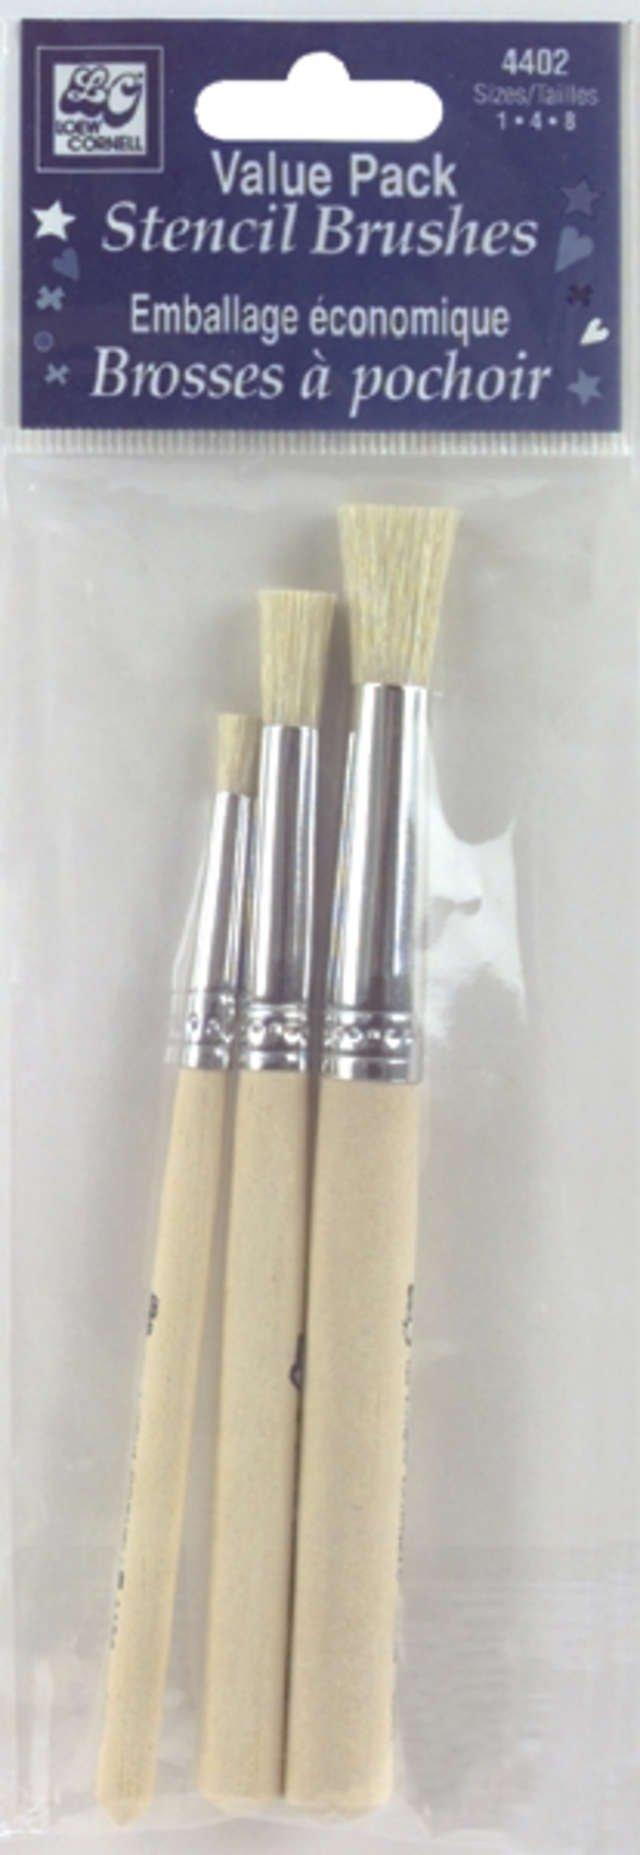 Loew-Cornell 4402 Bristle Stencil Brush Set by Loew-Cornell